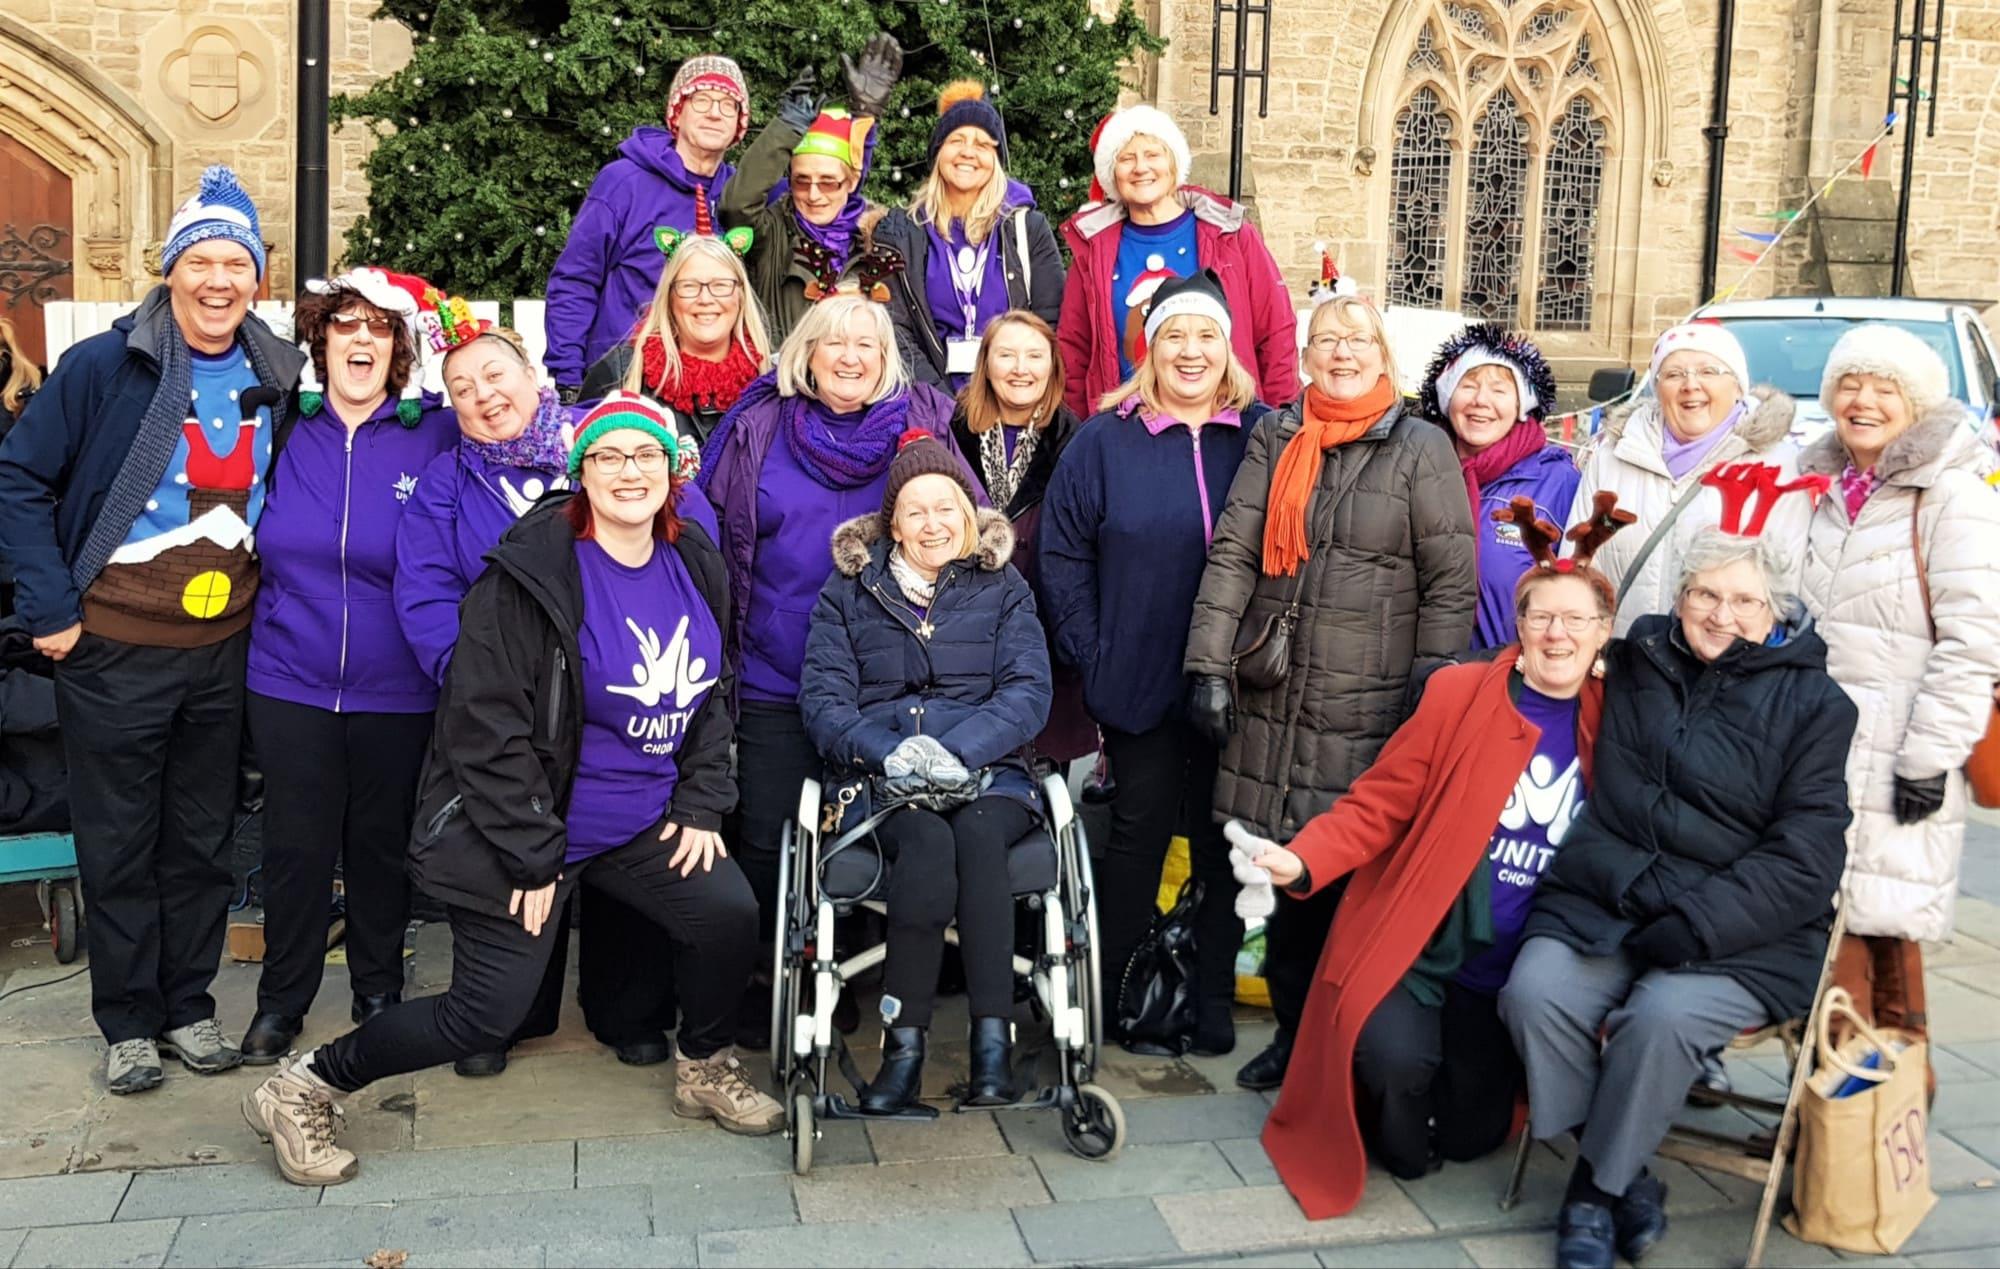 Unity Choir, led by The Singing Elf, Durham Market Place, Christmas 2018